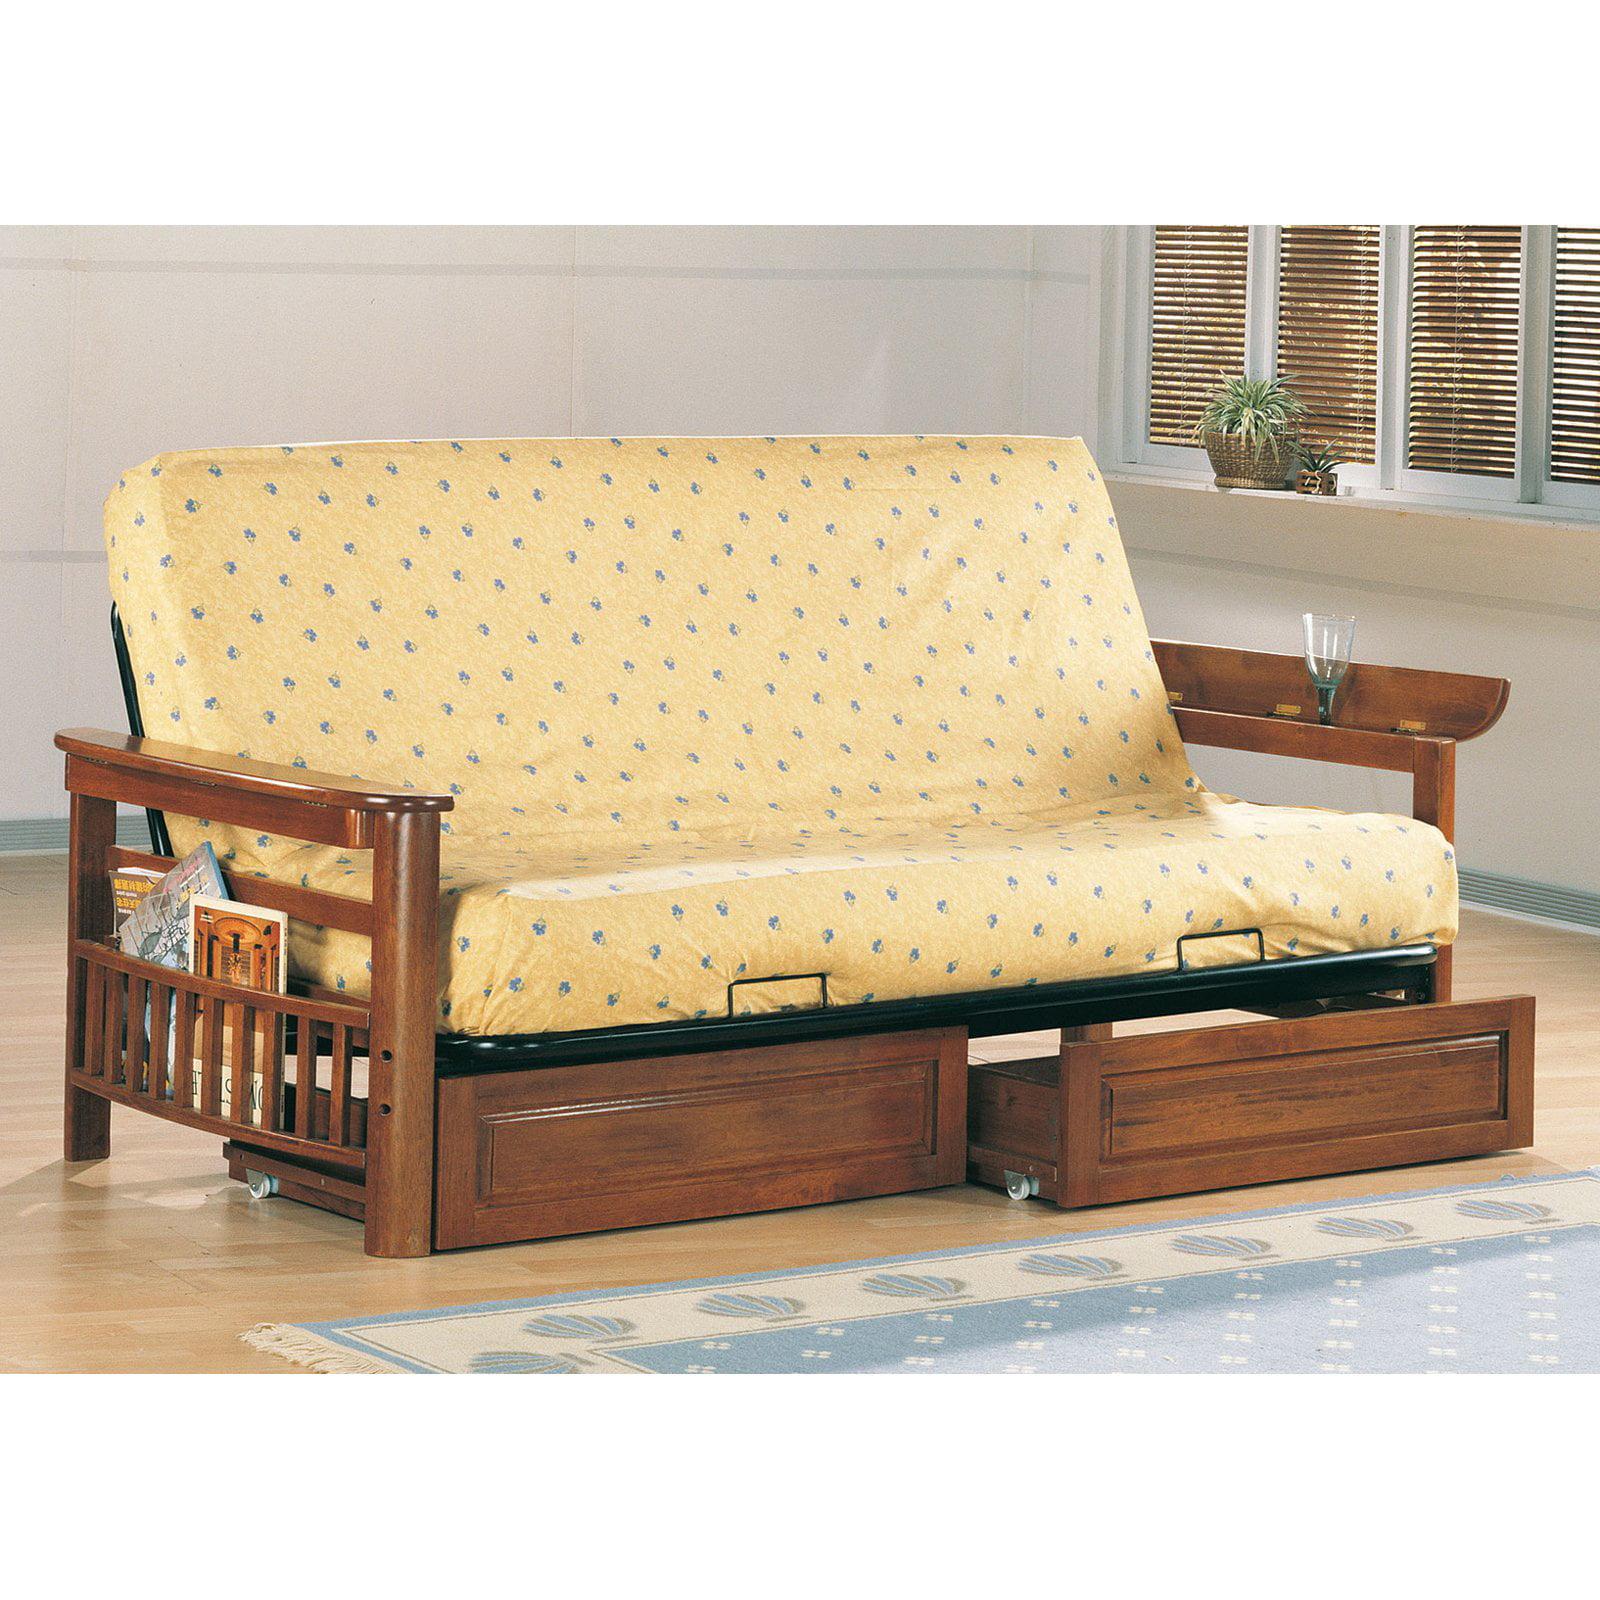 Coaster Dayton Convertible Sofa with Optional Drawers